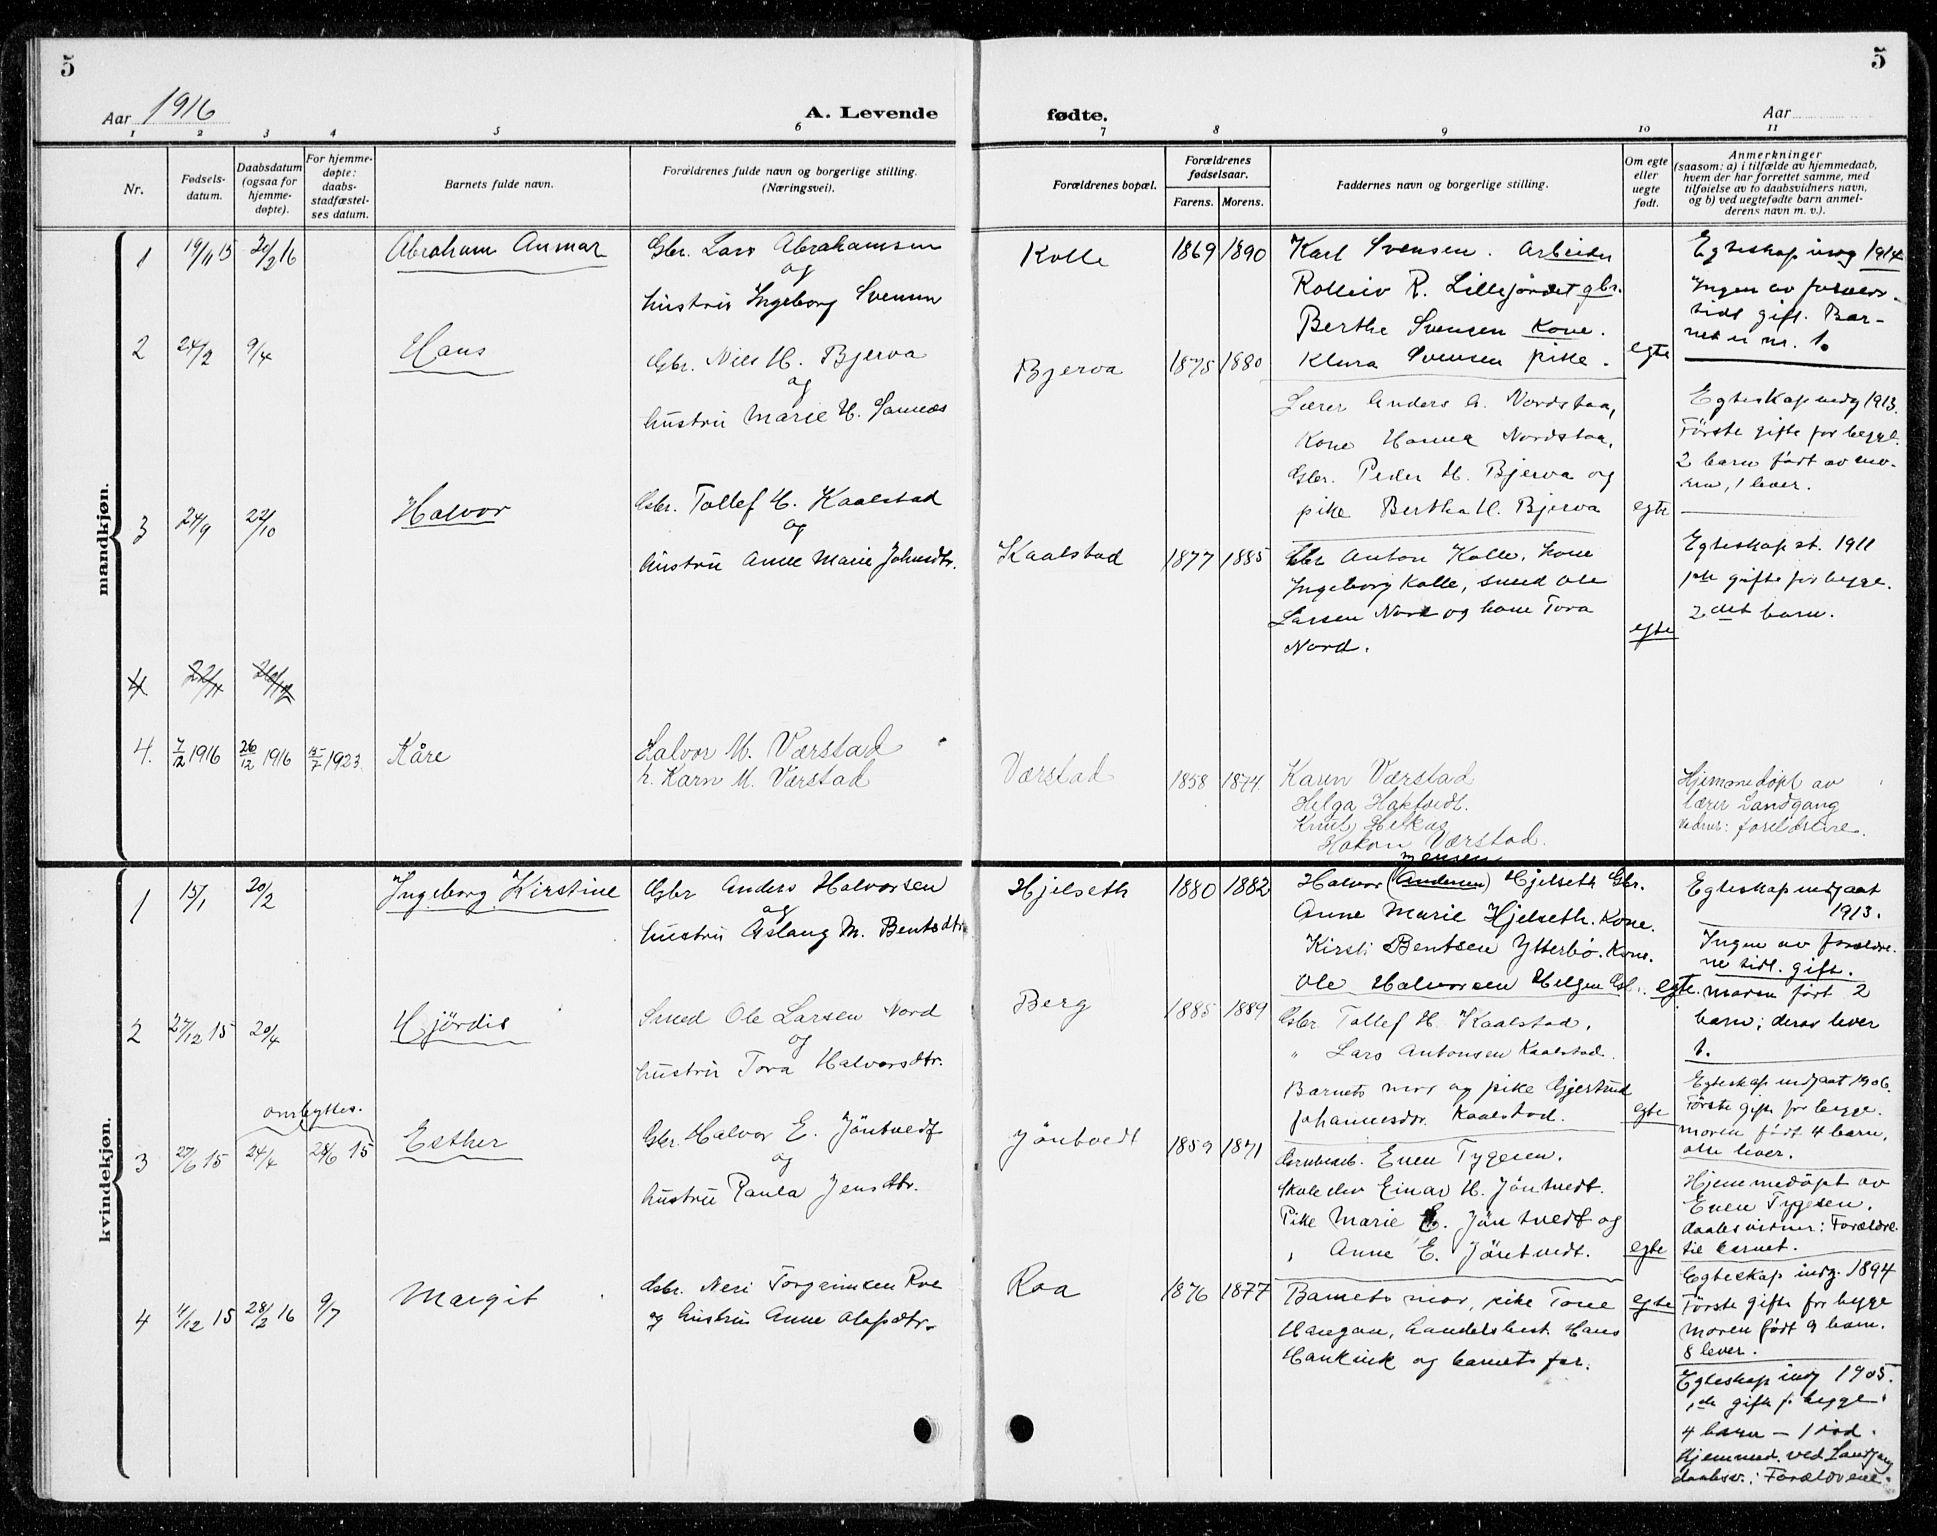 SAKO, Holla kirkebøker, G/Gb/L0003: Klokkerbok nr. II 3, 1914-1941, s. 5